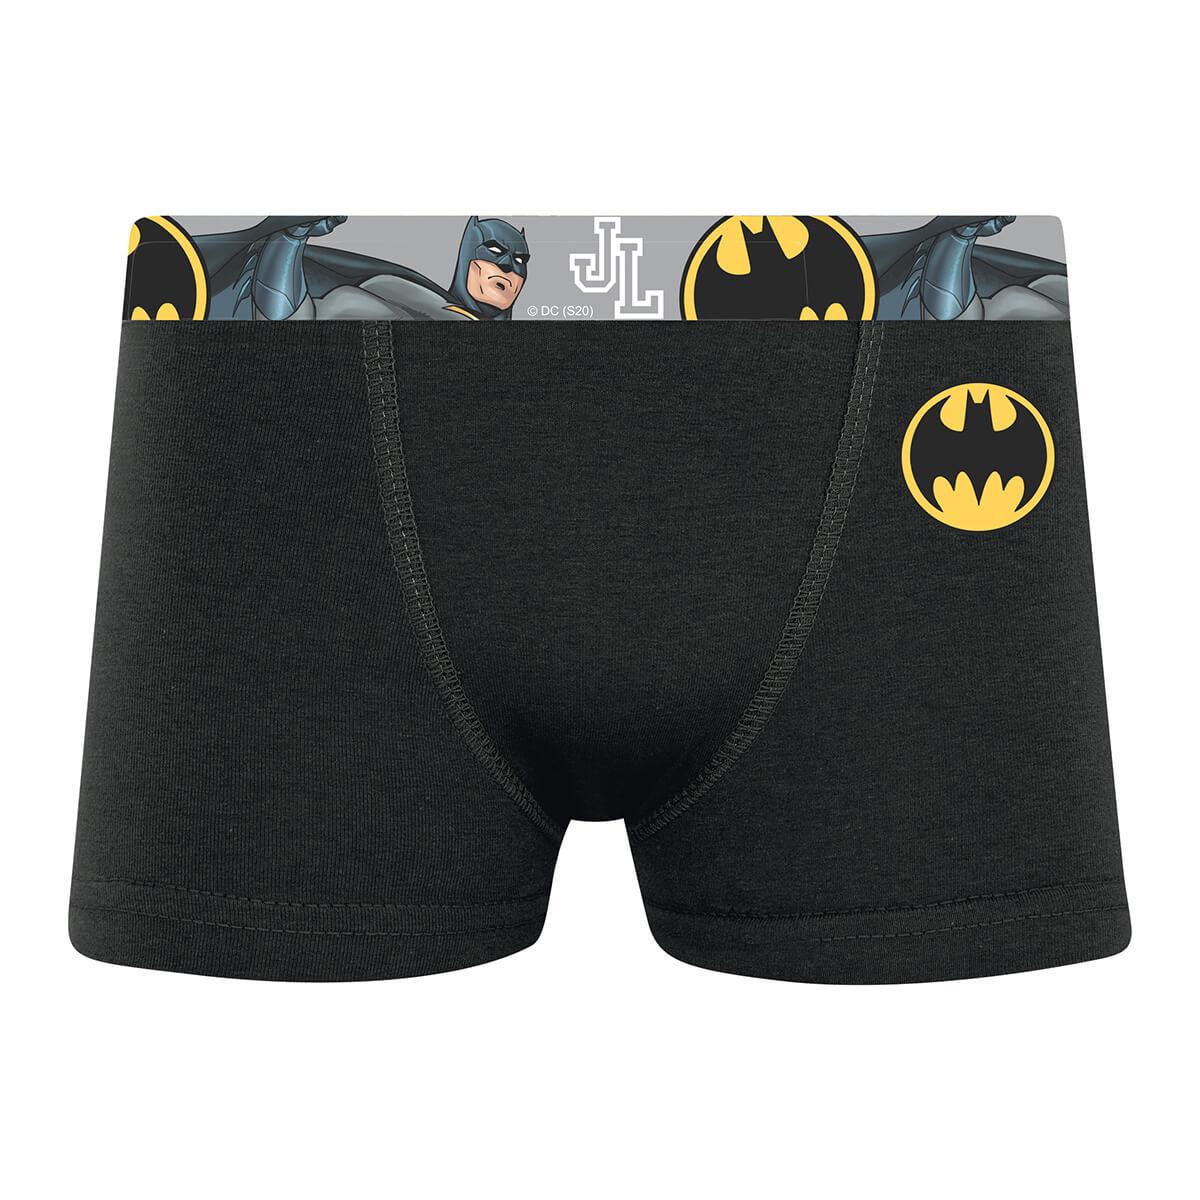 Cueca Boxer Infantil Liga da Justiça Batman Dark Knight